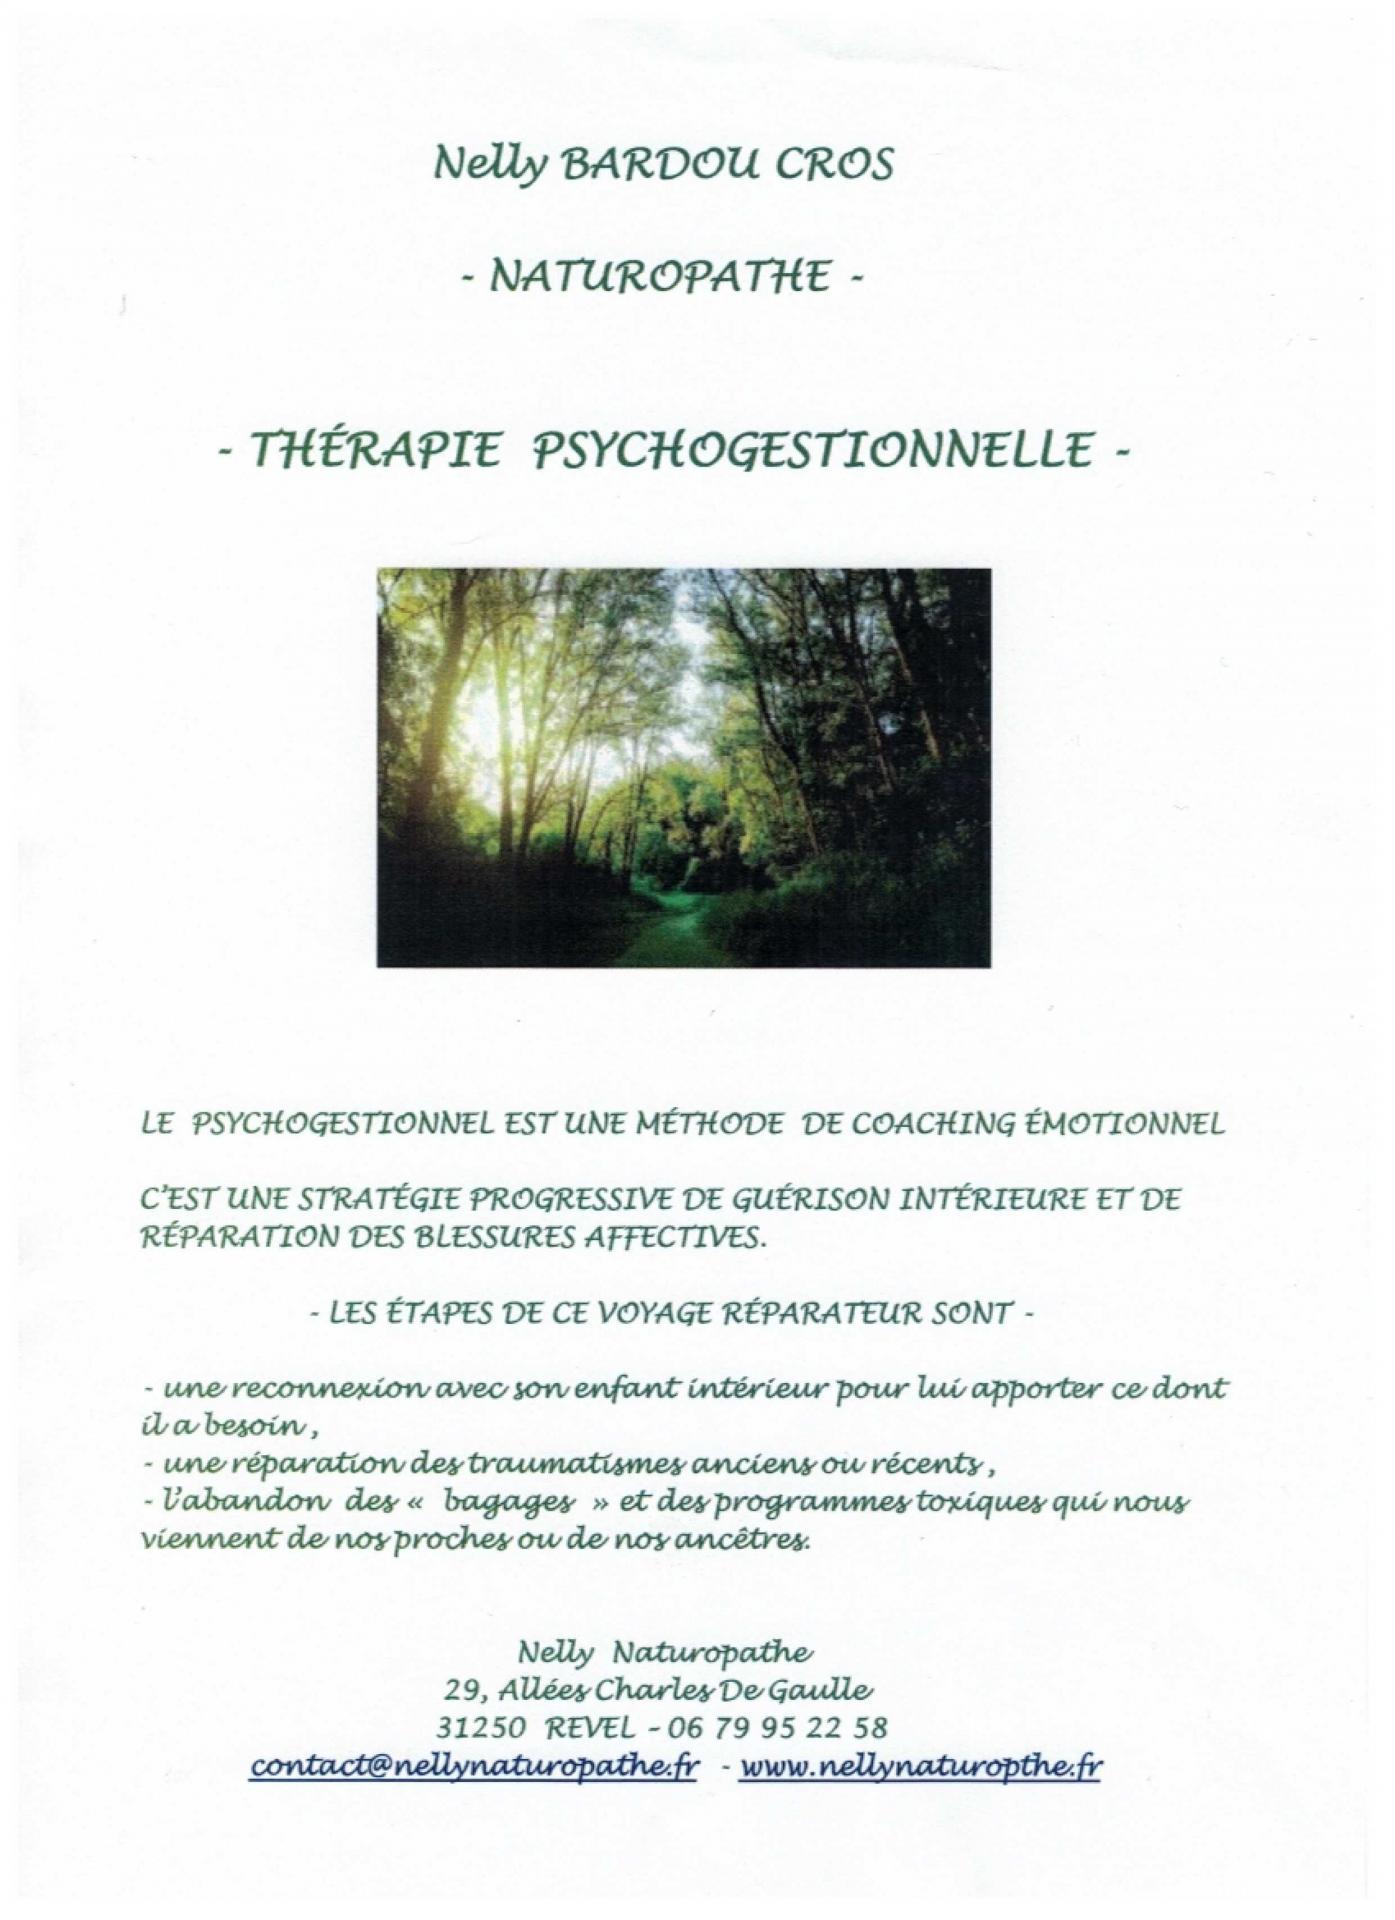 Naturopathie nelly1